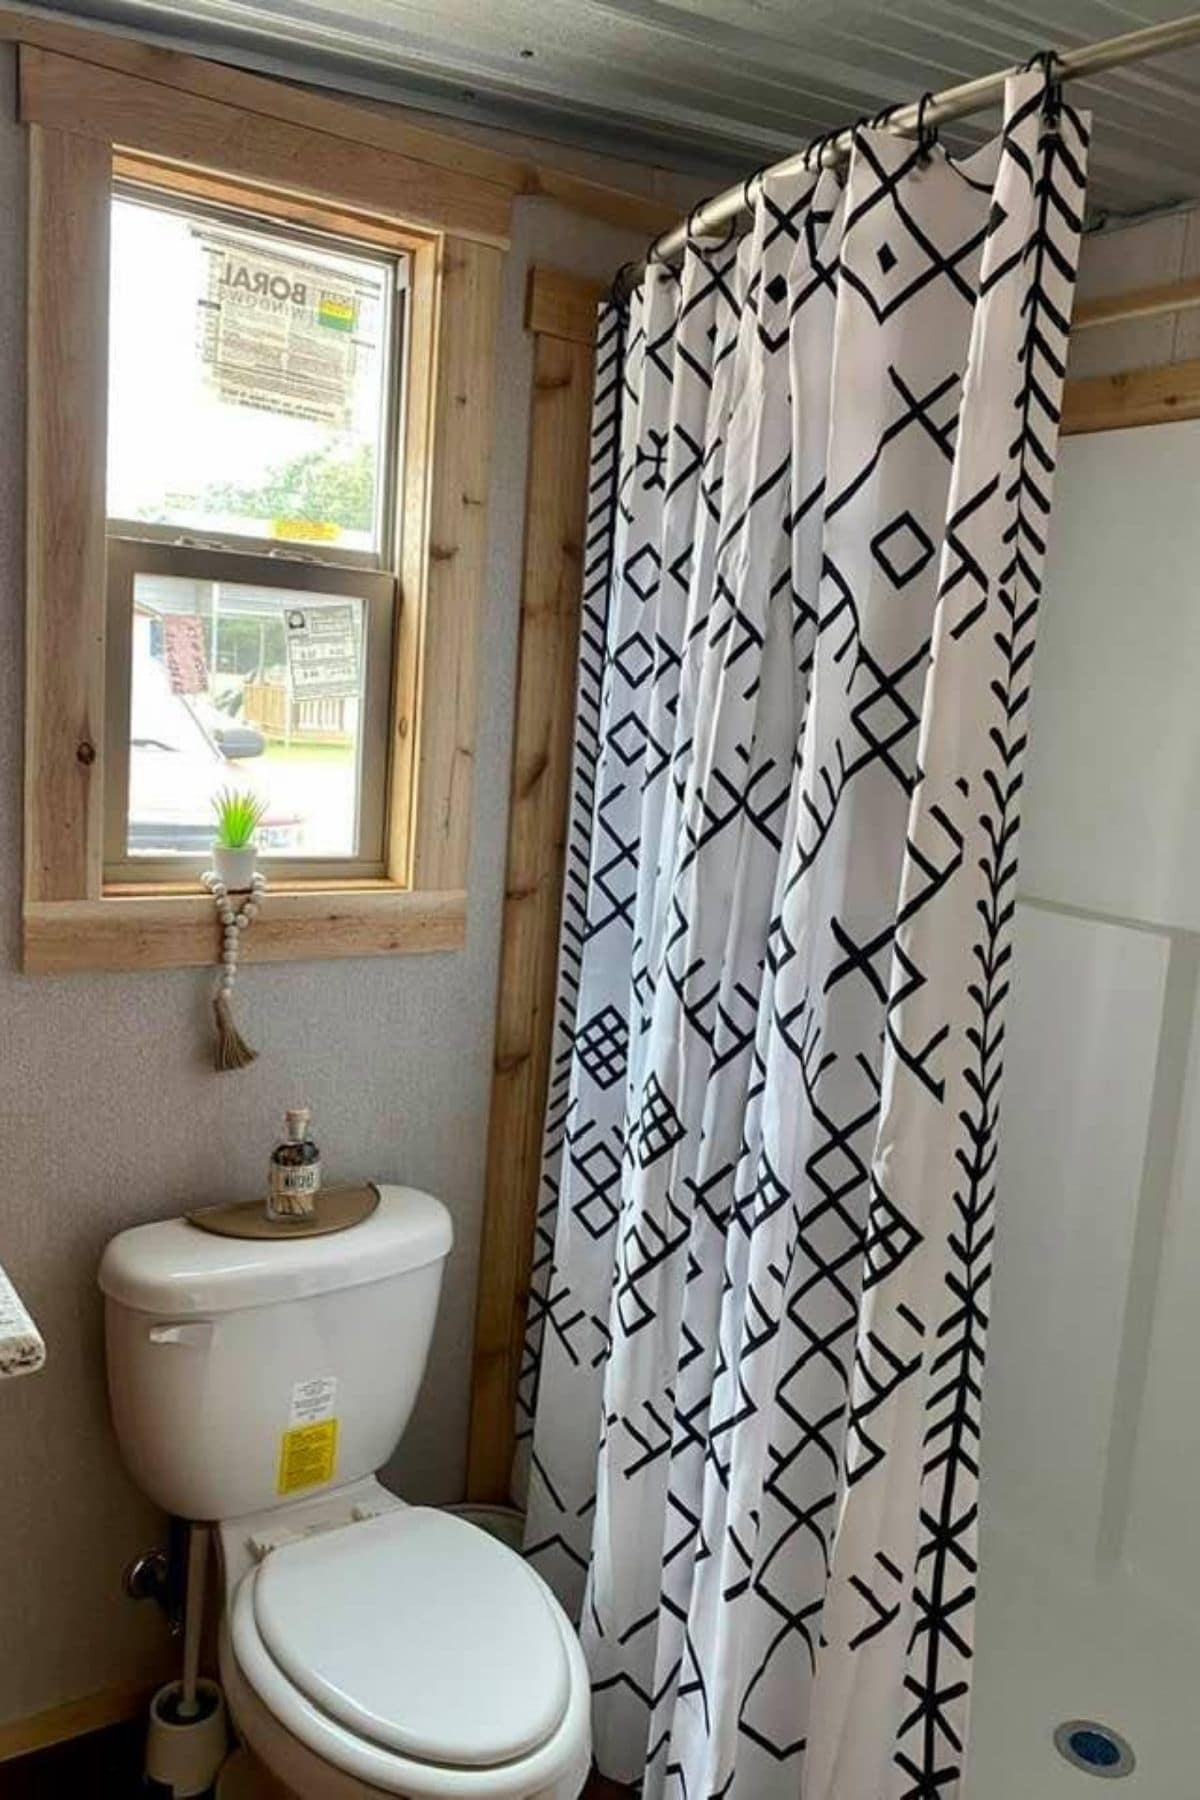 Flush toilet under small window next to shower